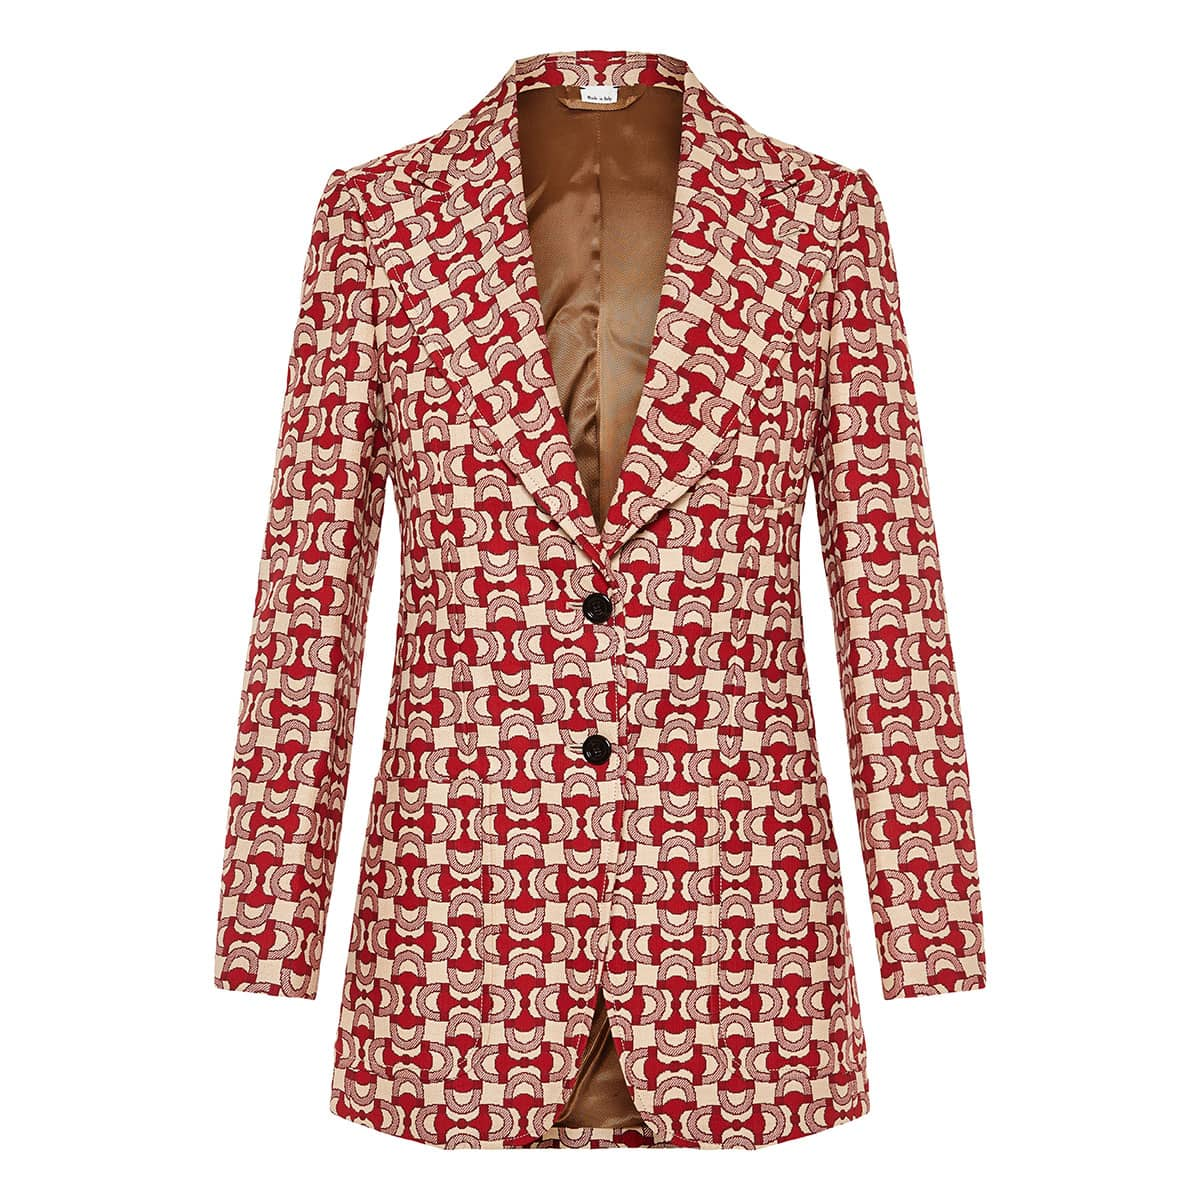 Horsebit print jacquard blazer